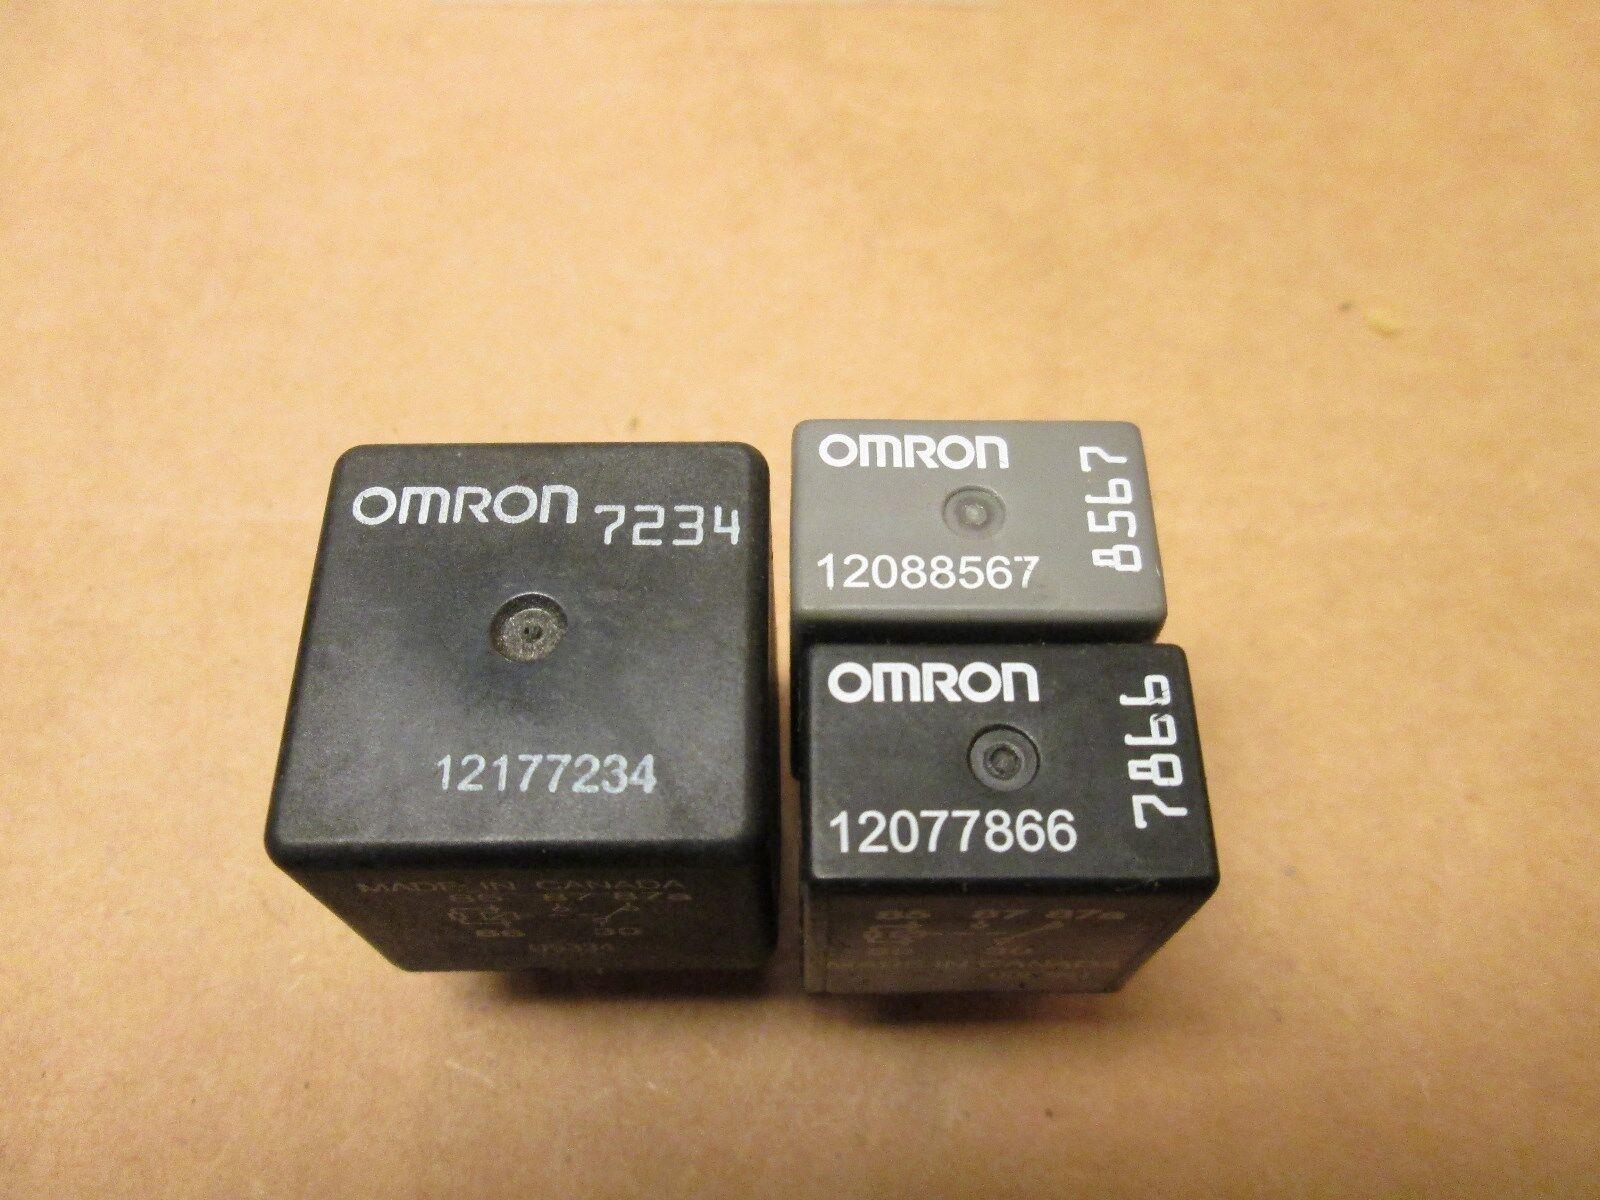 OMRON 7234 GM FAN RELAY 12177234 & 12077866 & 12088567 RELAY